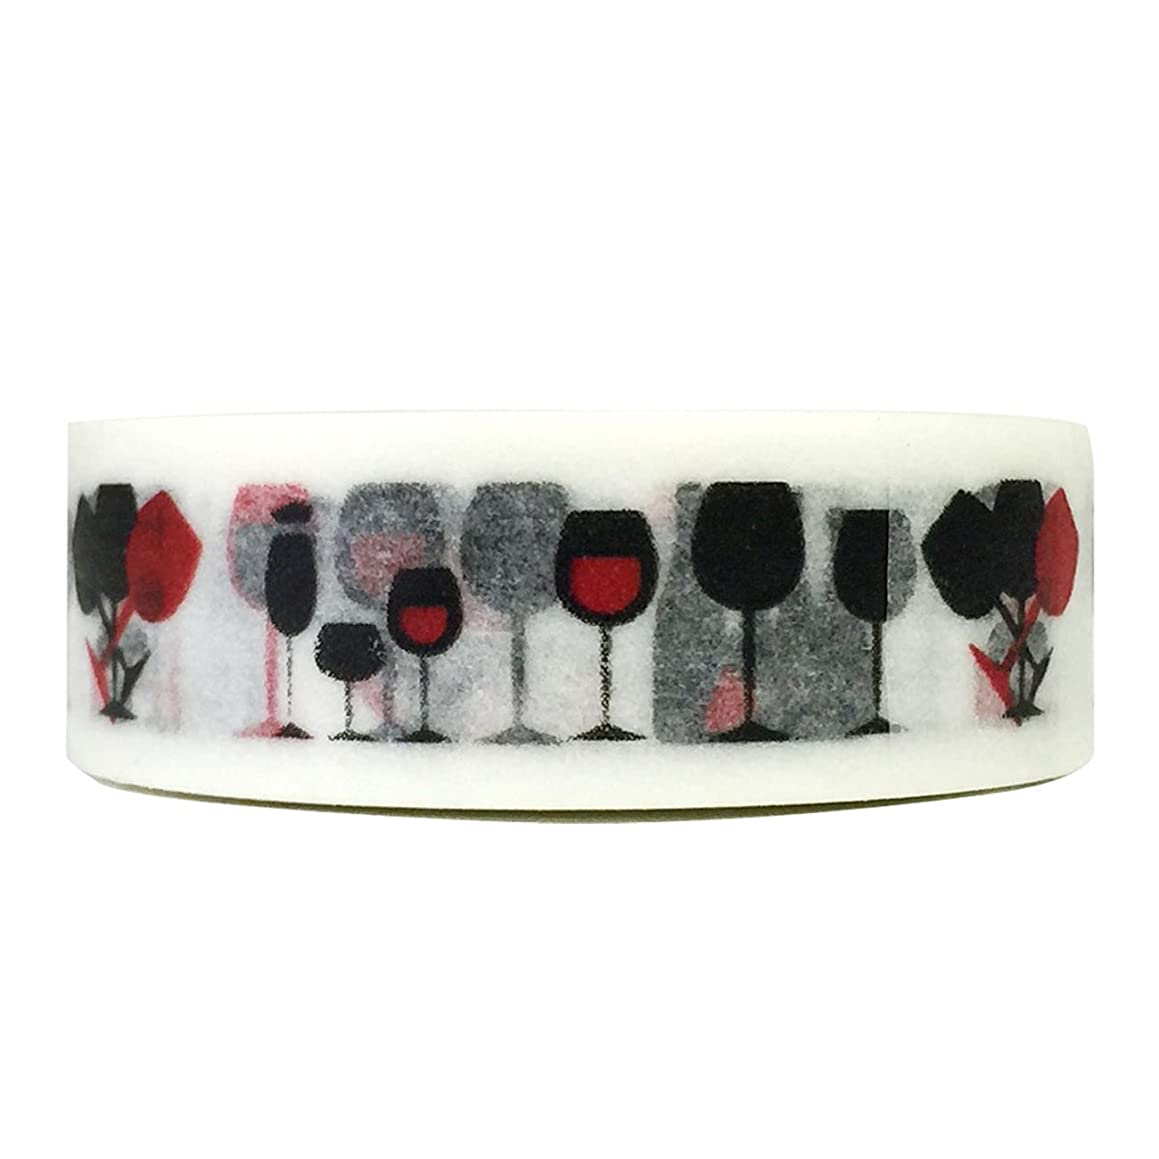 Wrapables Colorful Patterns Washi Masking Tape, Wine Glass